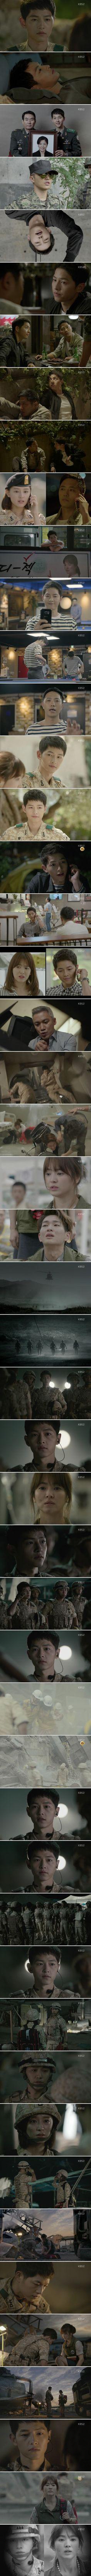 Added episode 6 captures for the Korean drama 'Descendants of the Sun'.